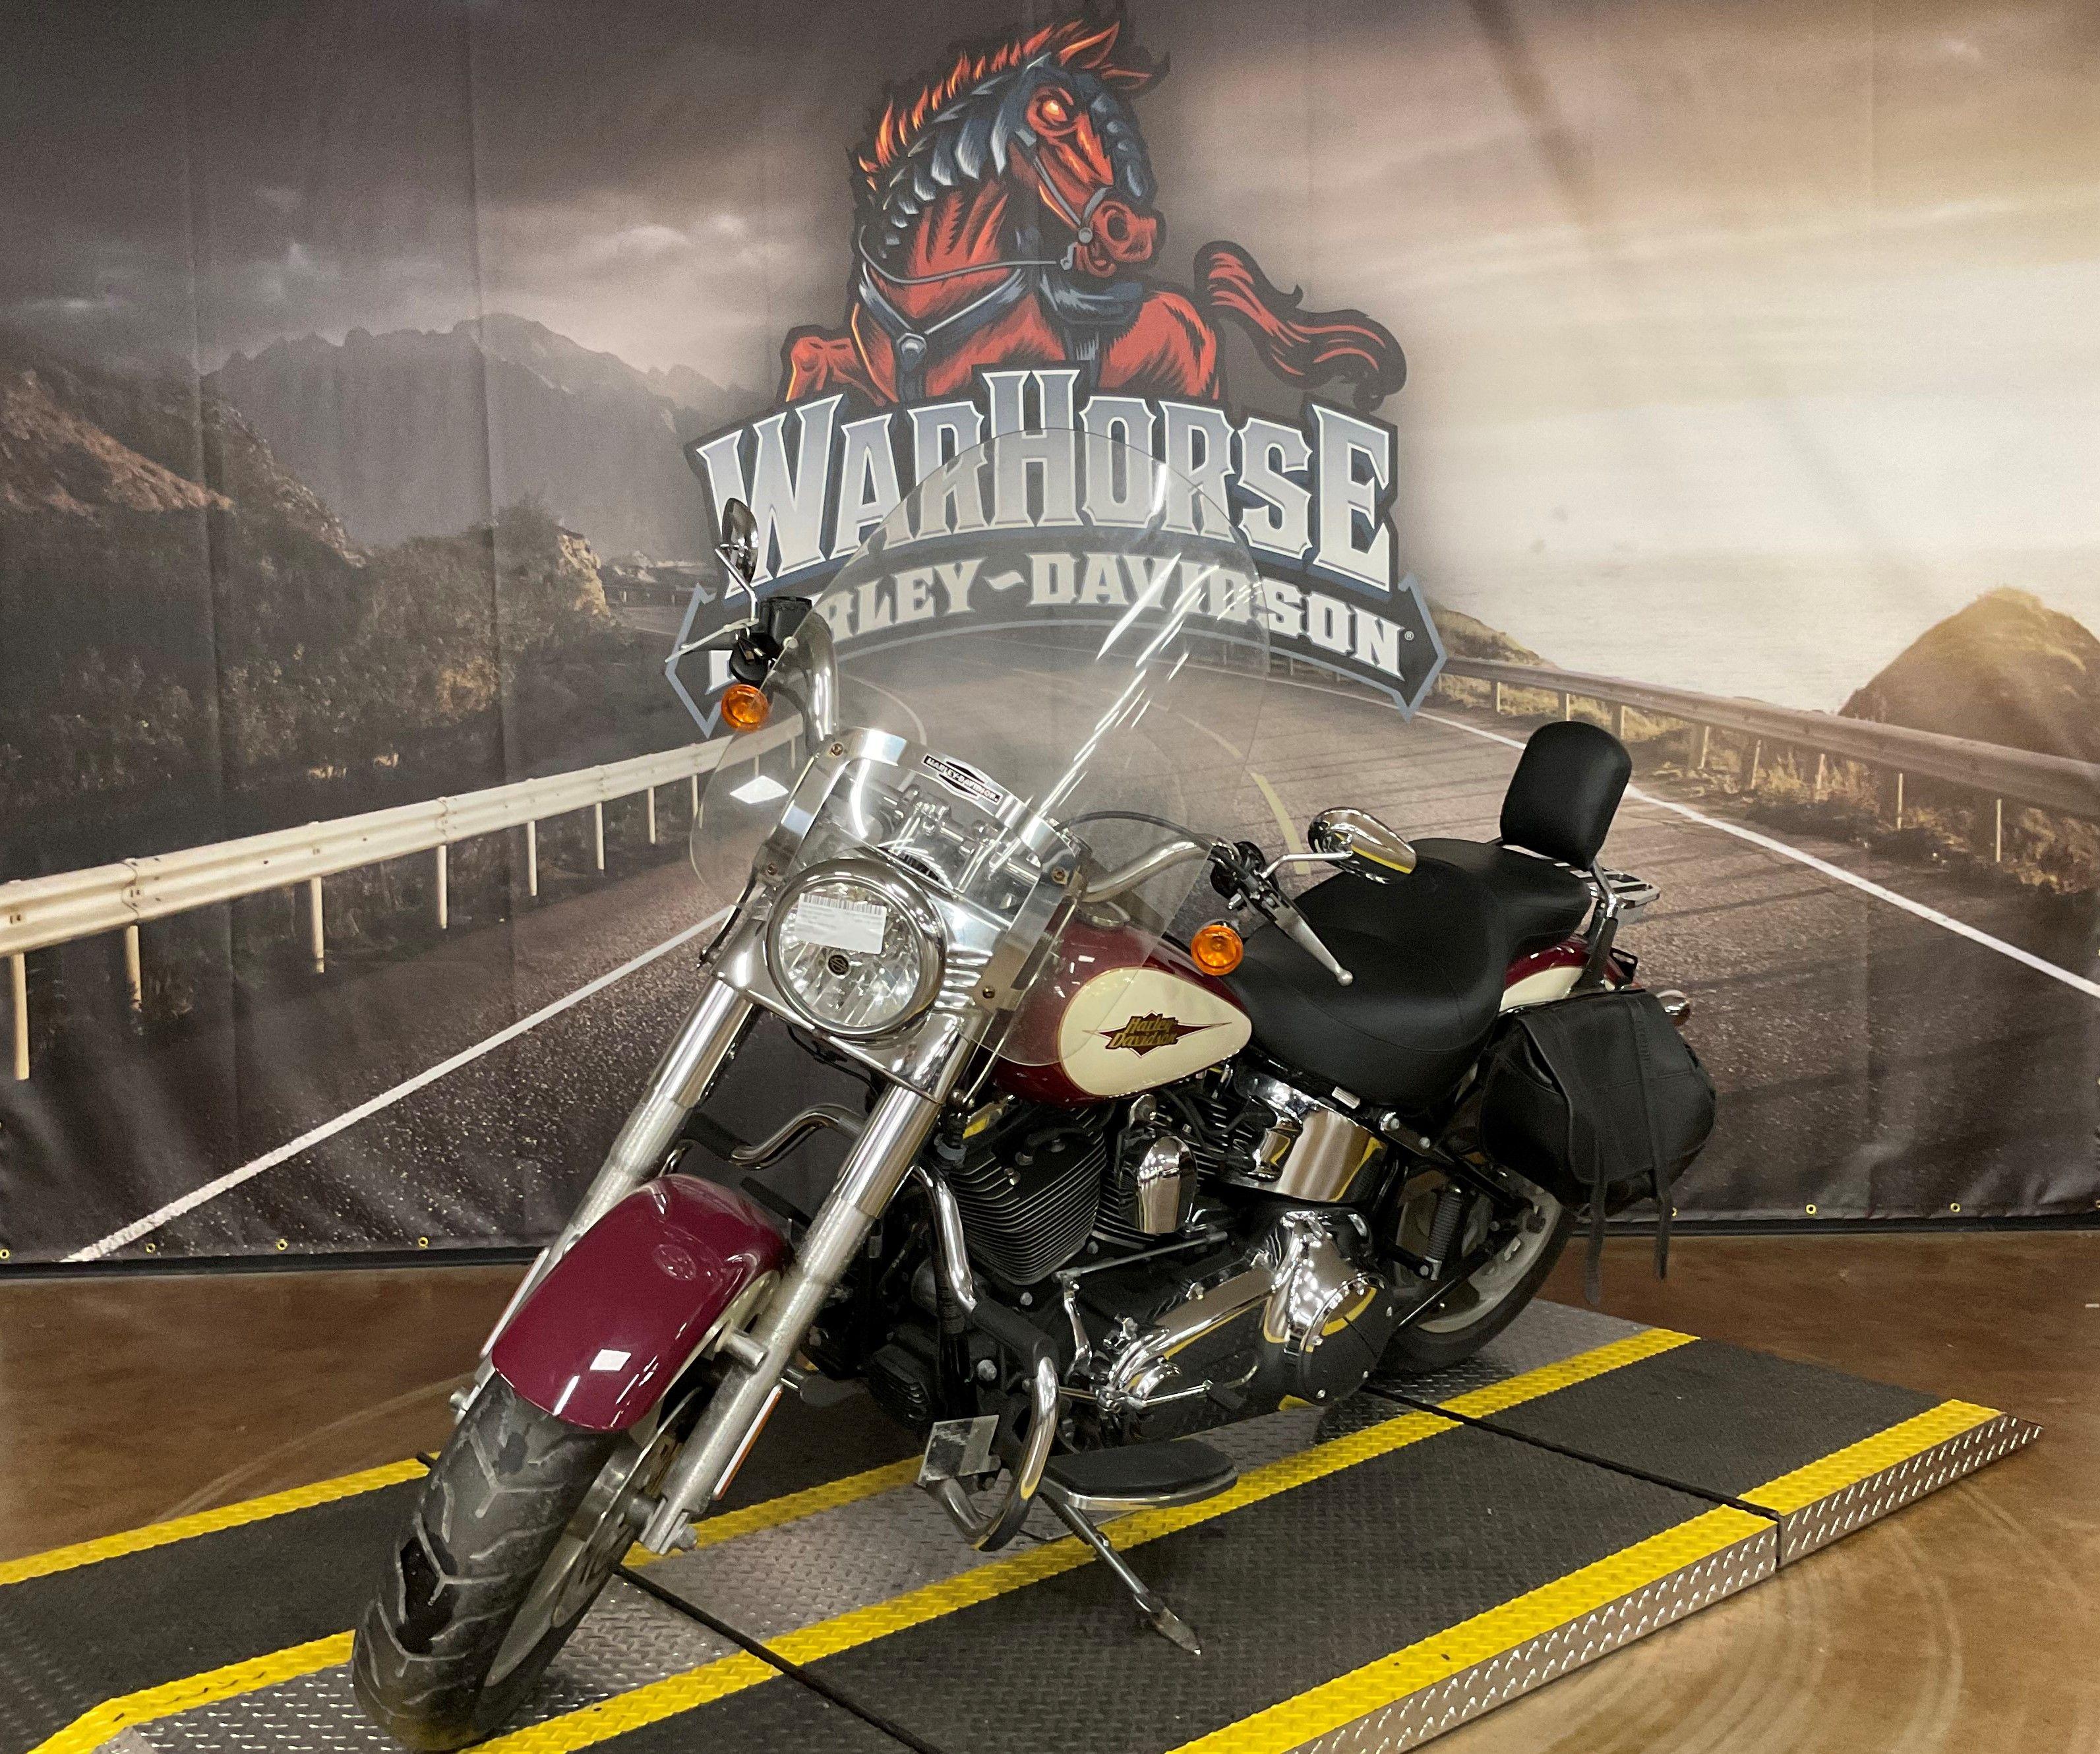 Pre-Owned 2007 Harley-Davidson Fat Boy